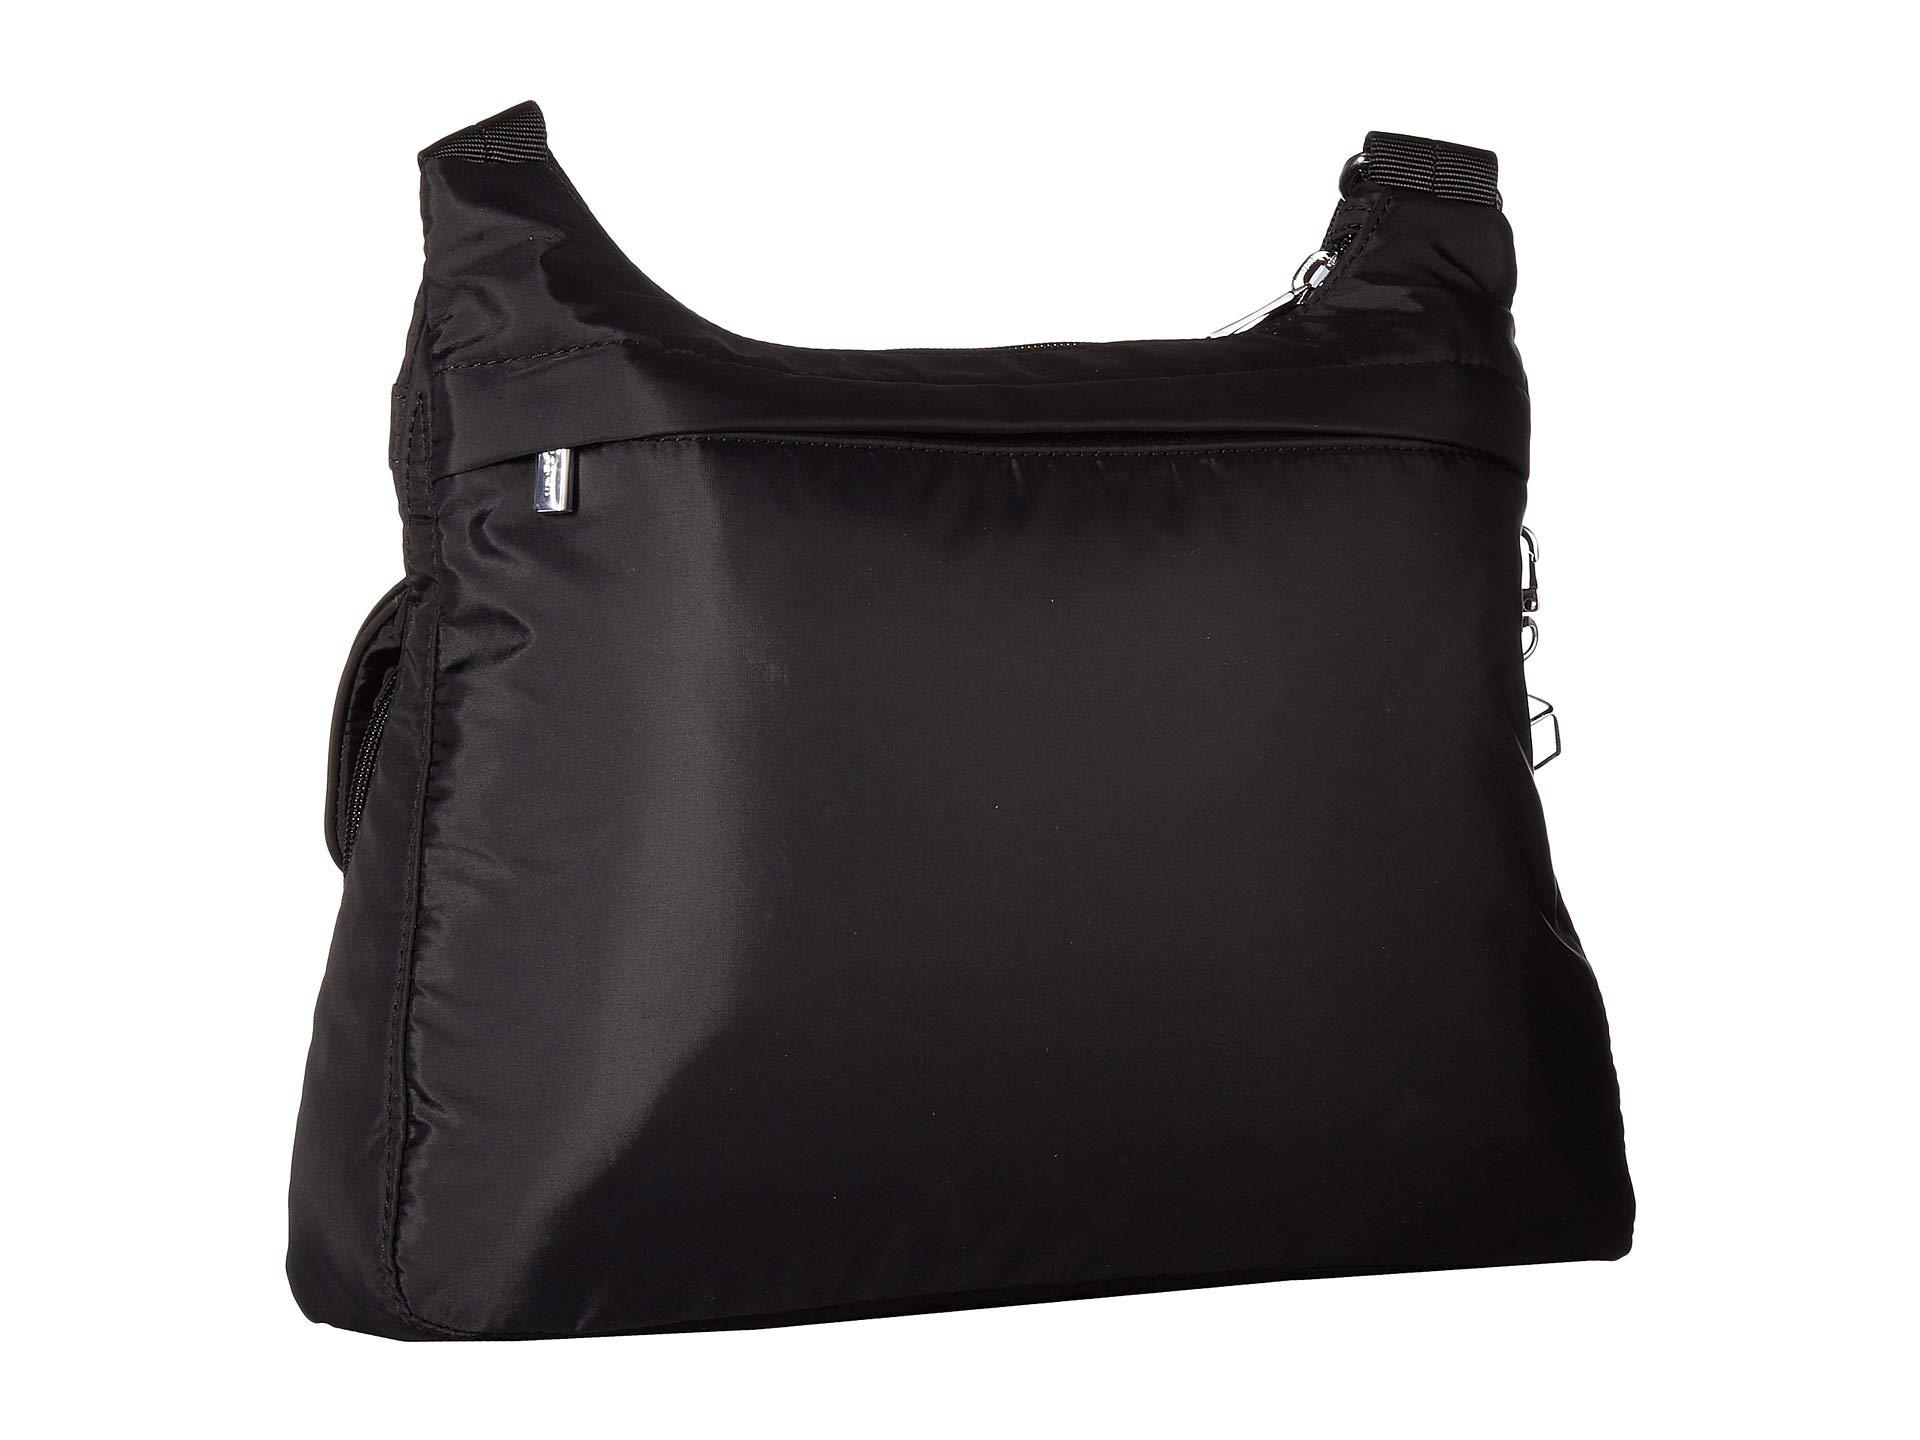 b352e4501a09 Lyst - Hedgren Prairie Rfid Shoulder Bag (titanium) Shoulder ...